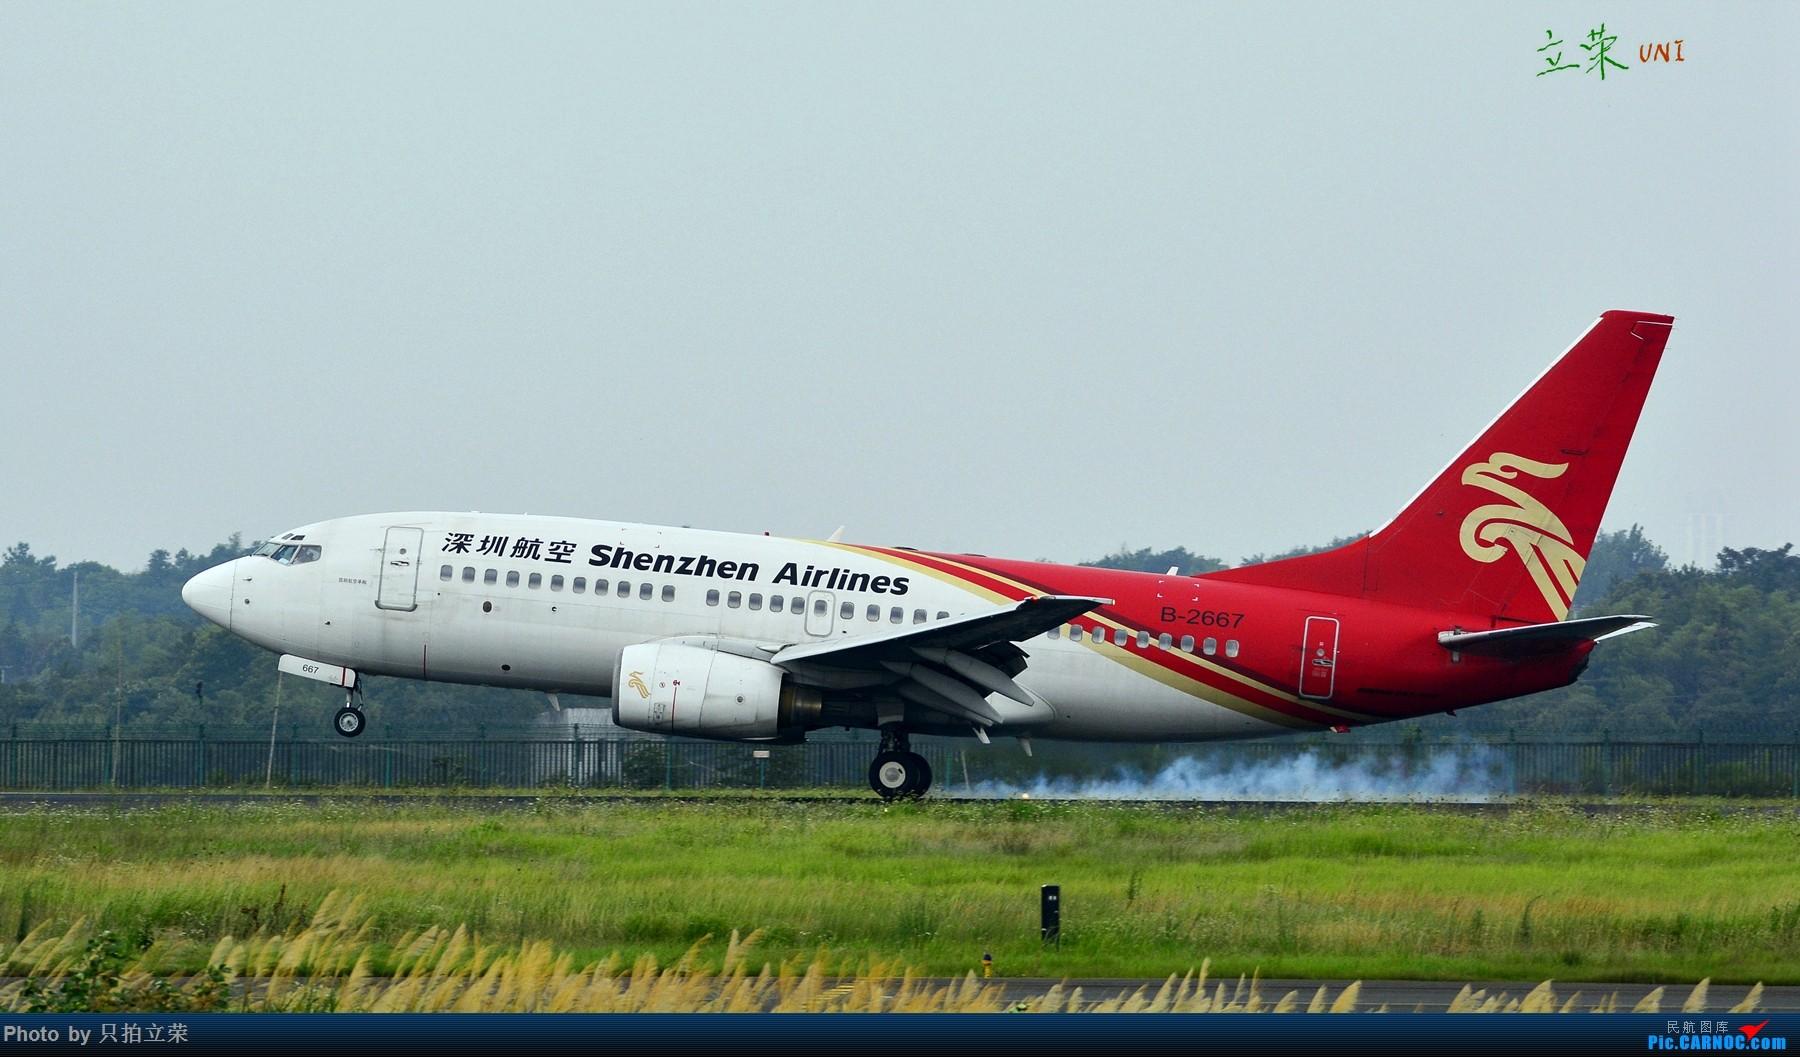 Re:[原创]长沙黄花机场73G/737-700擦烟小集锦 BOEING 737-700 B-2667 中国长沙黄花国际机场